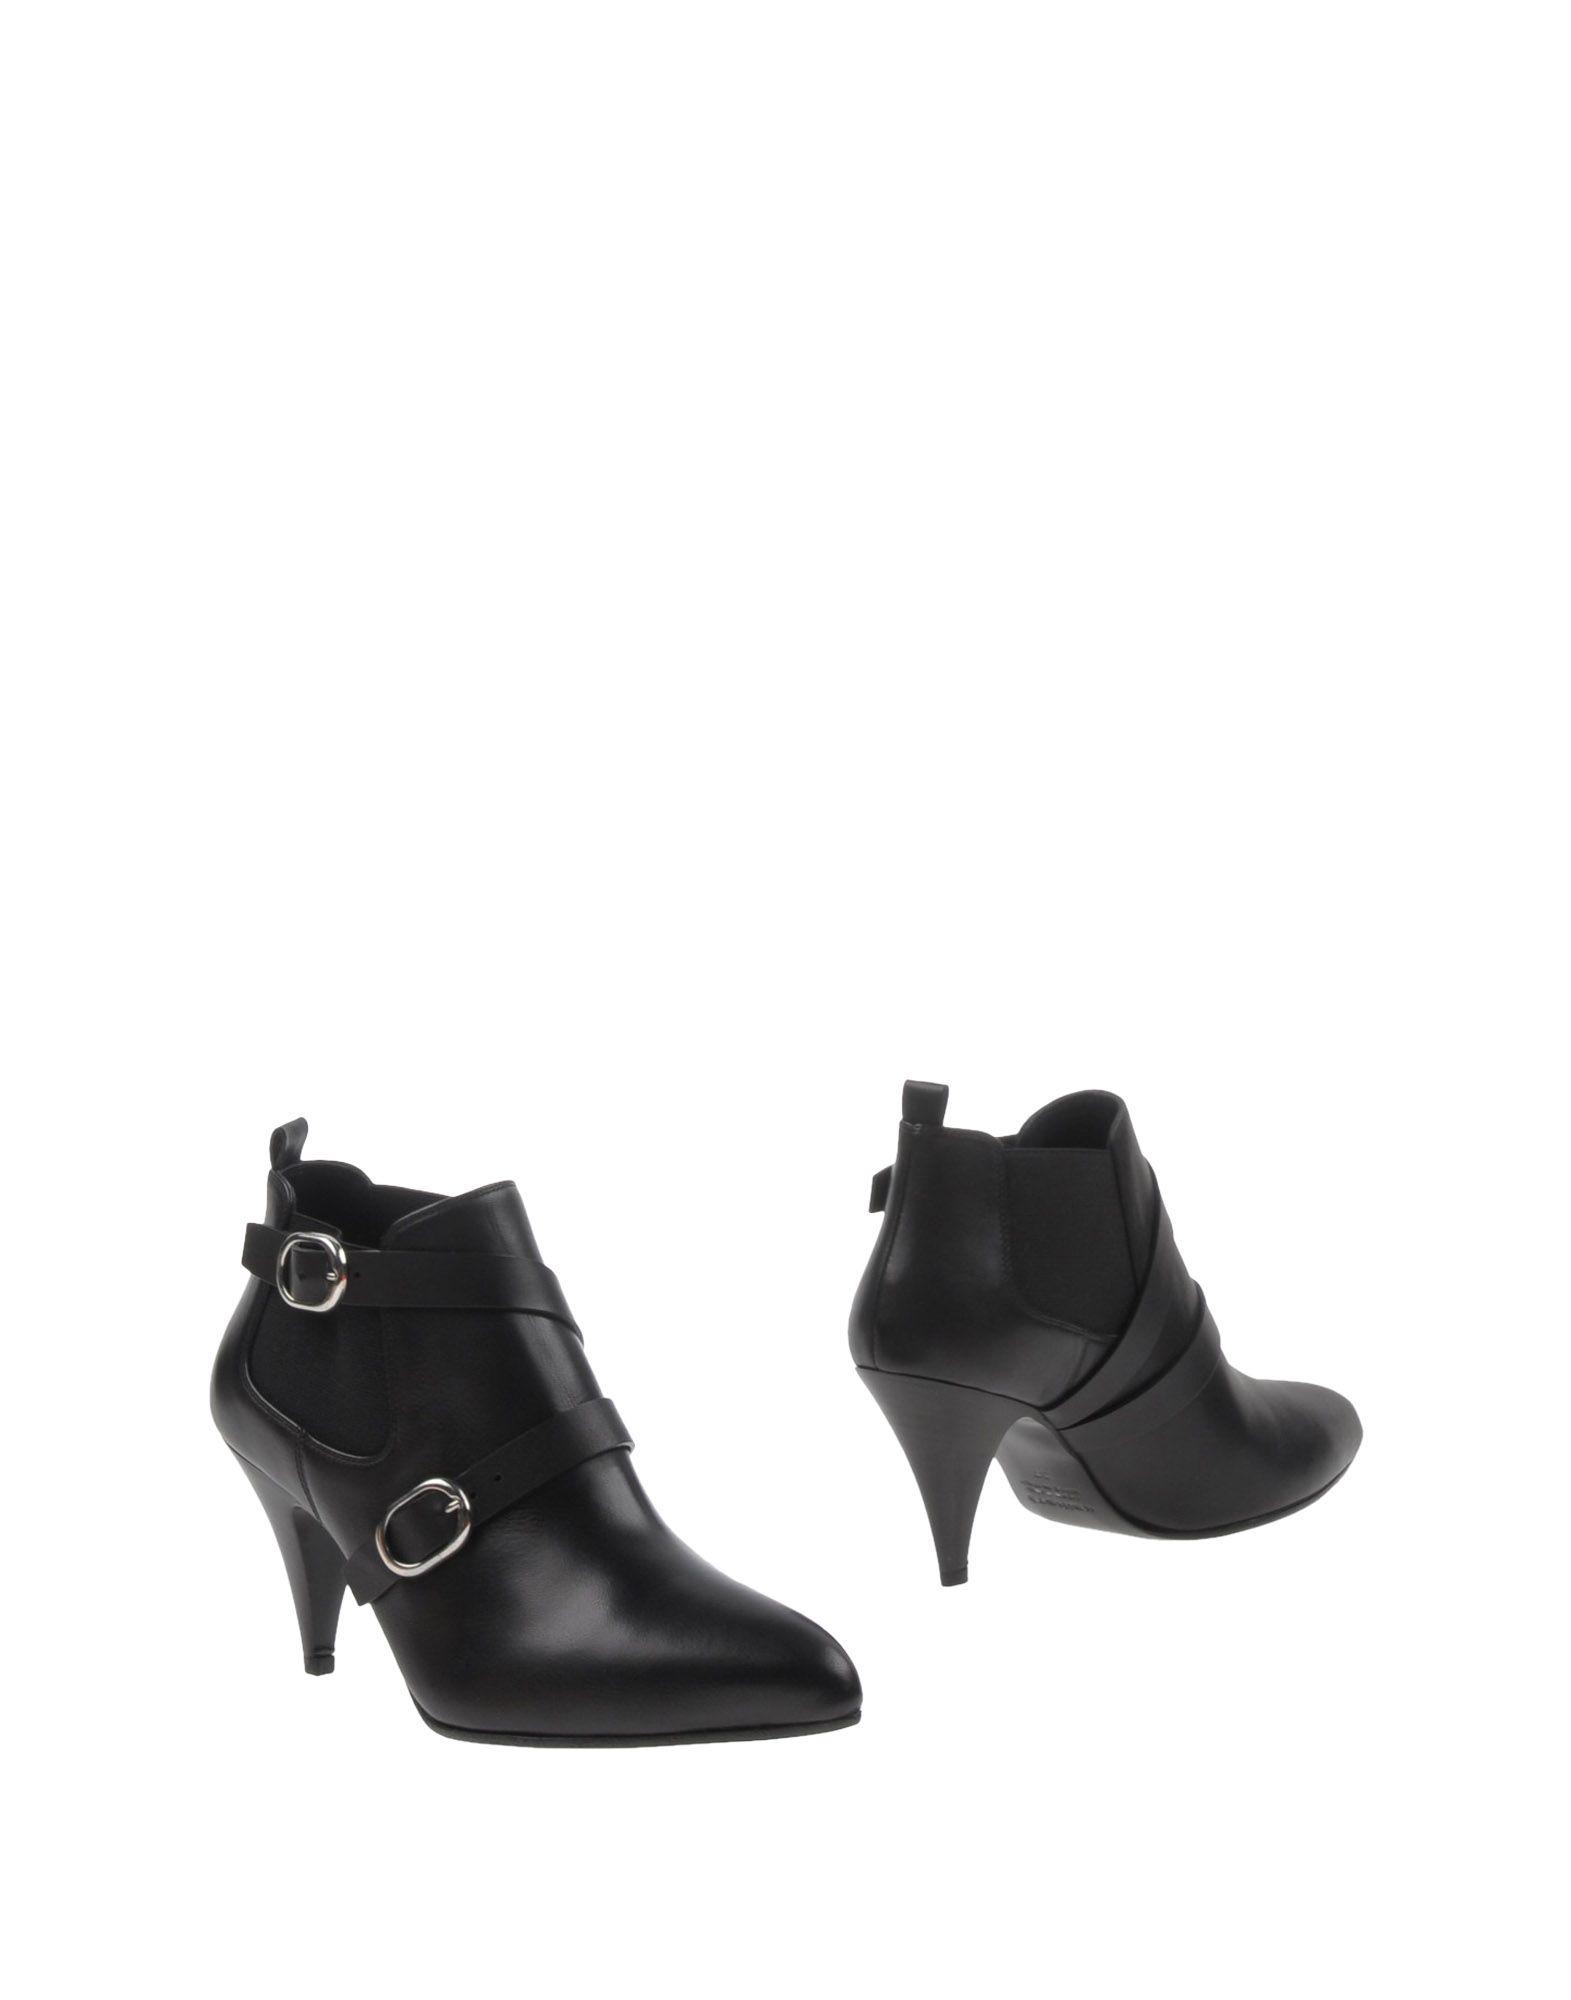 Kallistè Stiefelette Damen  11359991JJ Gute Qualität beliebte Schuhe